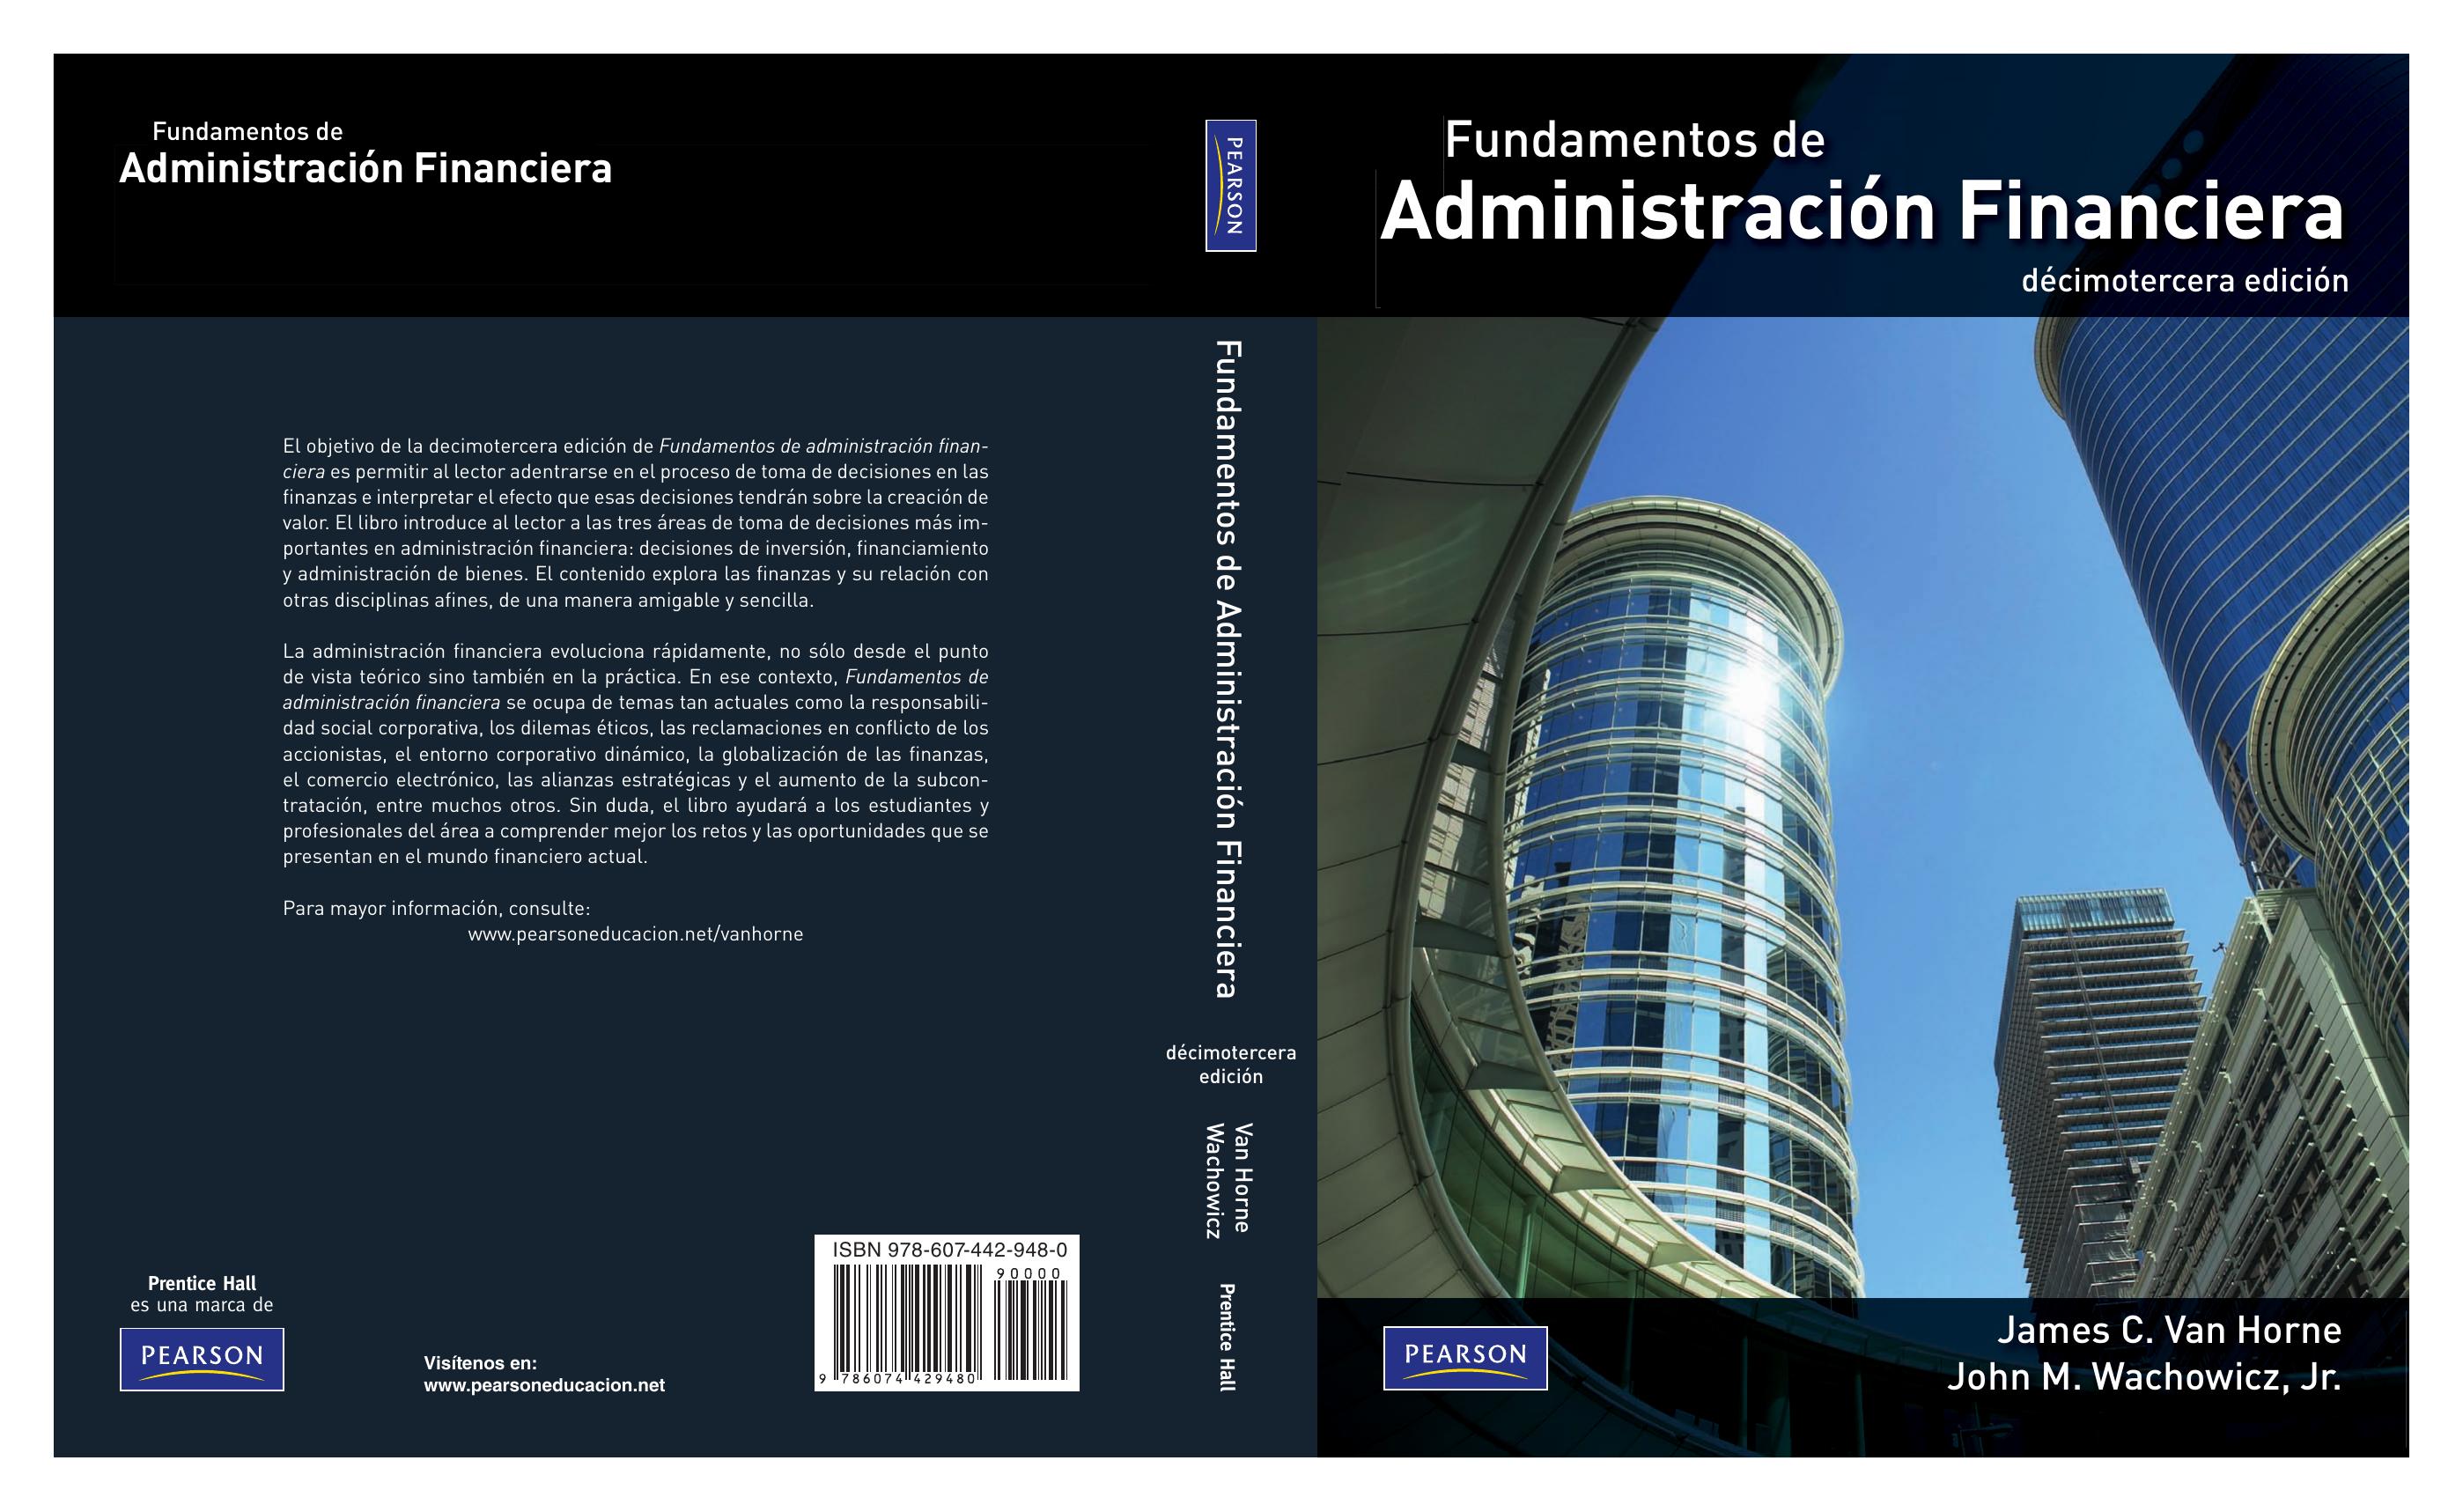 afd8e014f0f8 fundamentos-de-administracion-financiera-13-van-horne